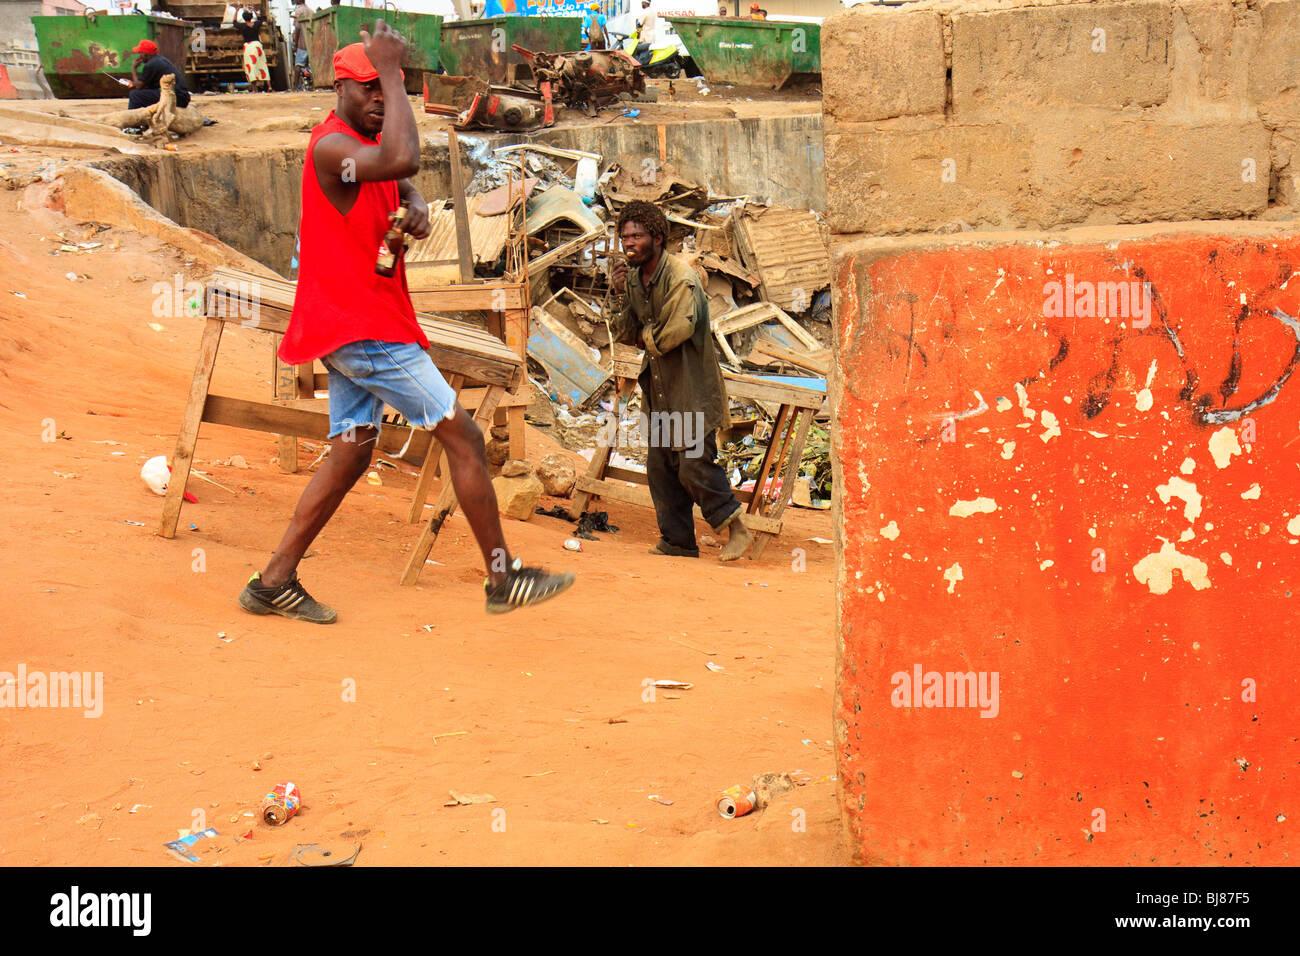 Africa Angola Luanda Bairro Orange Street - Stock Image